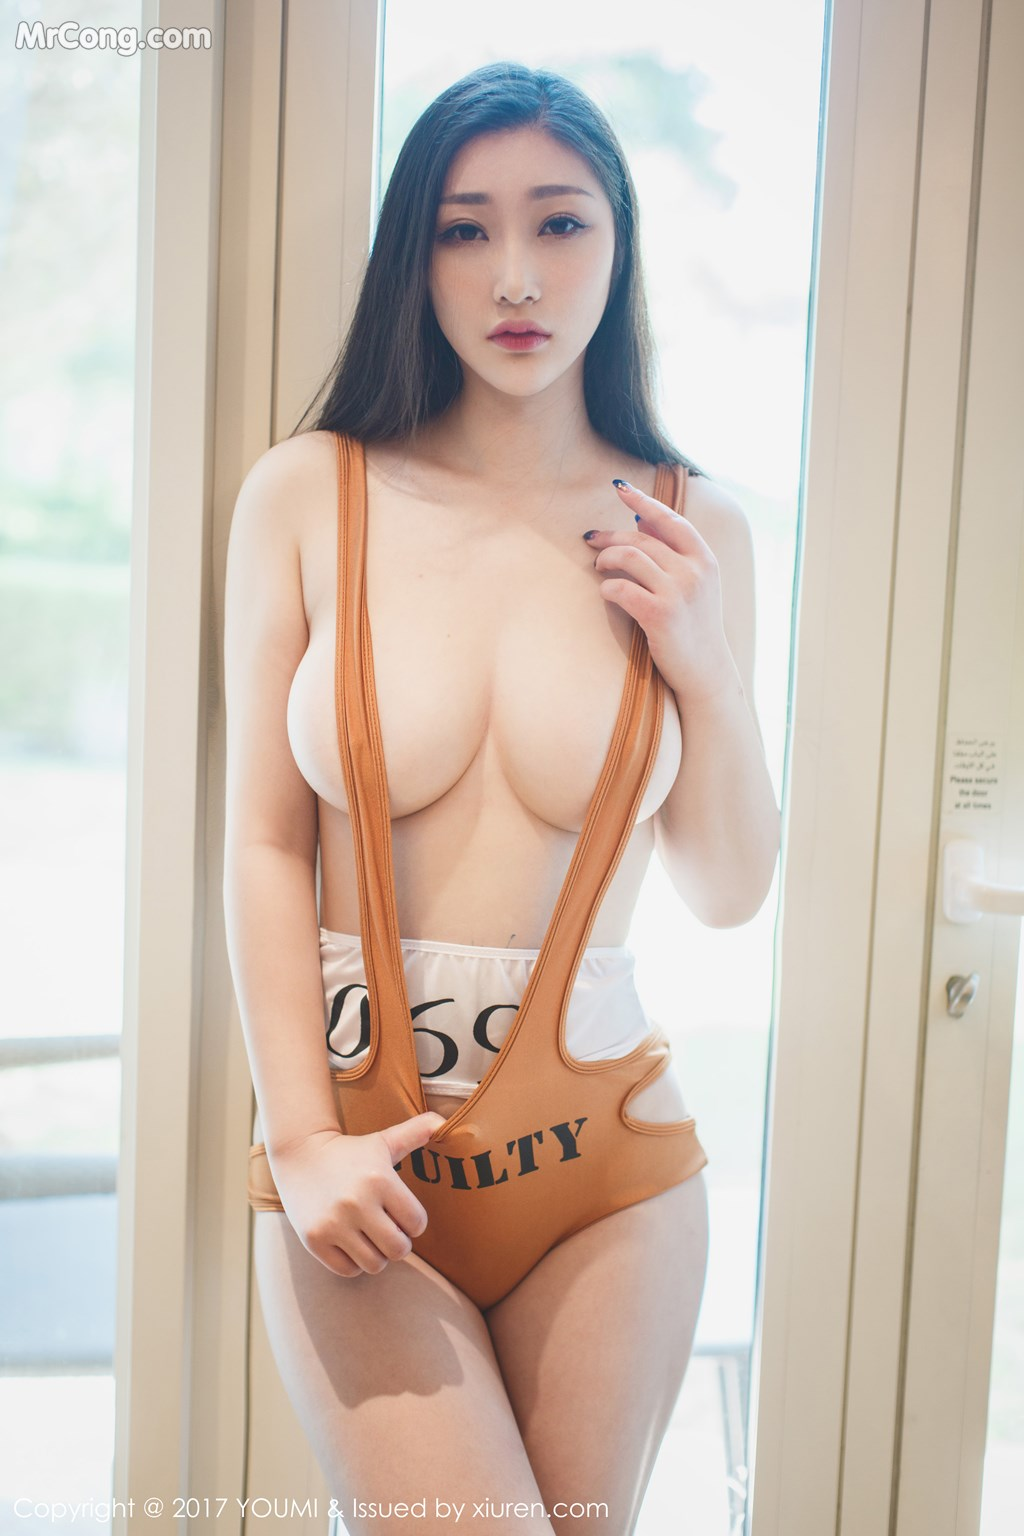 Image YouMi-Vol.077-Daji-Toxic-MrCong.com-015 in post YouMi Vol.077: Người mẫu Daji_Toxic (妲己_Toxic) (49 ảnh)